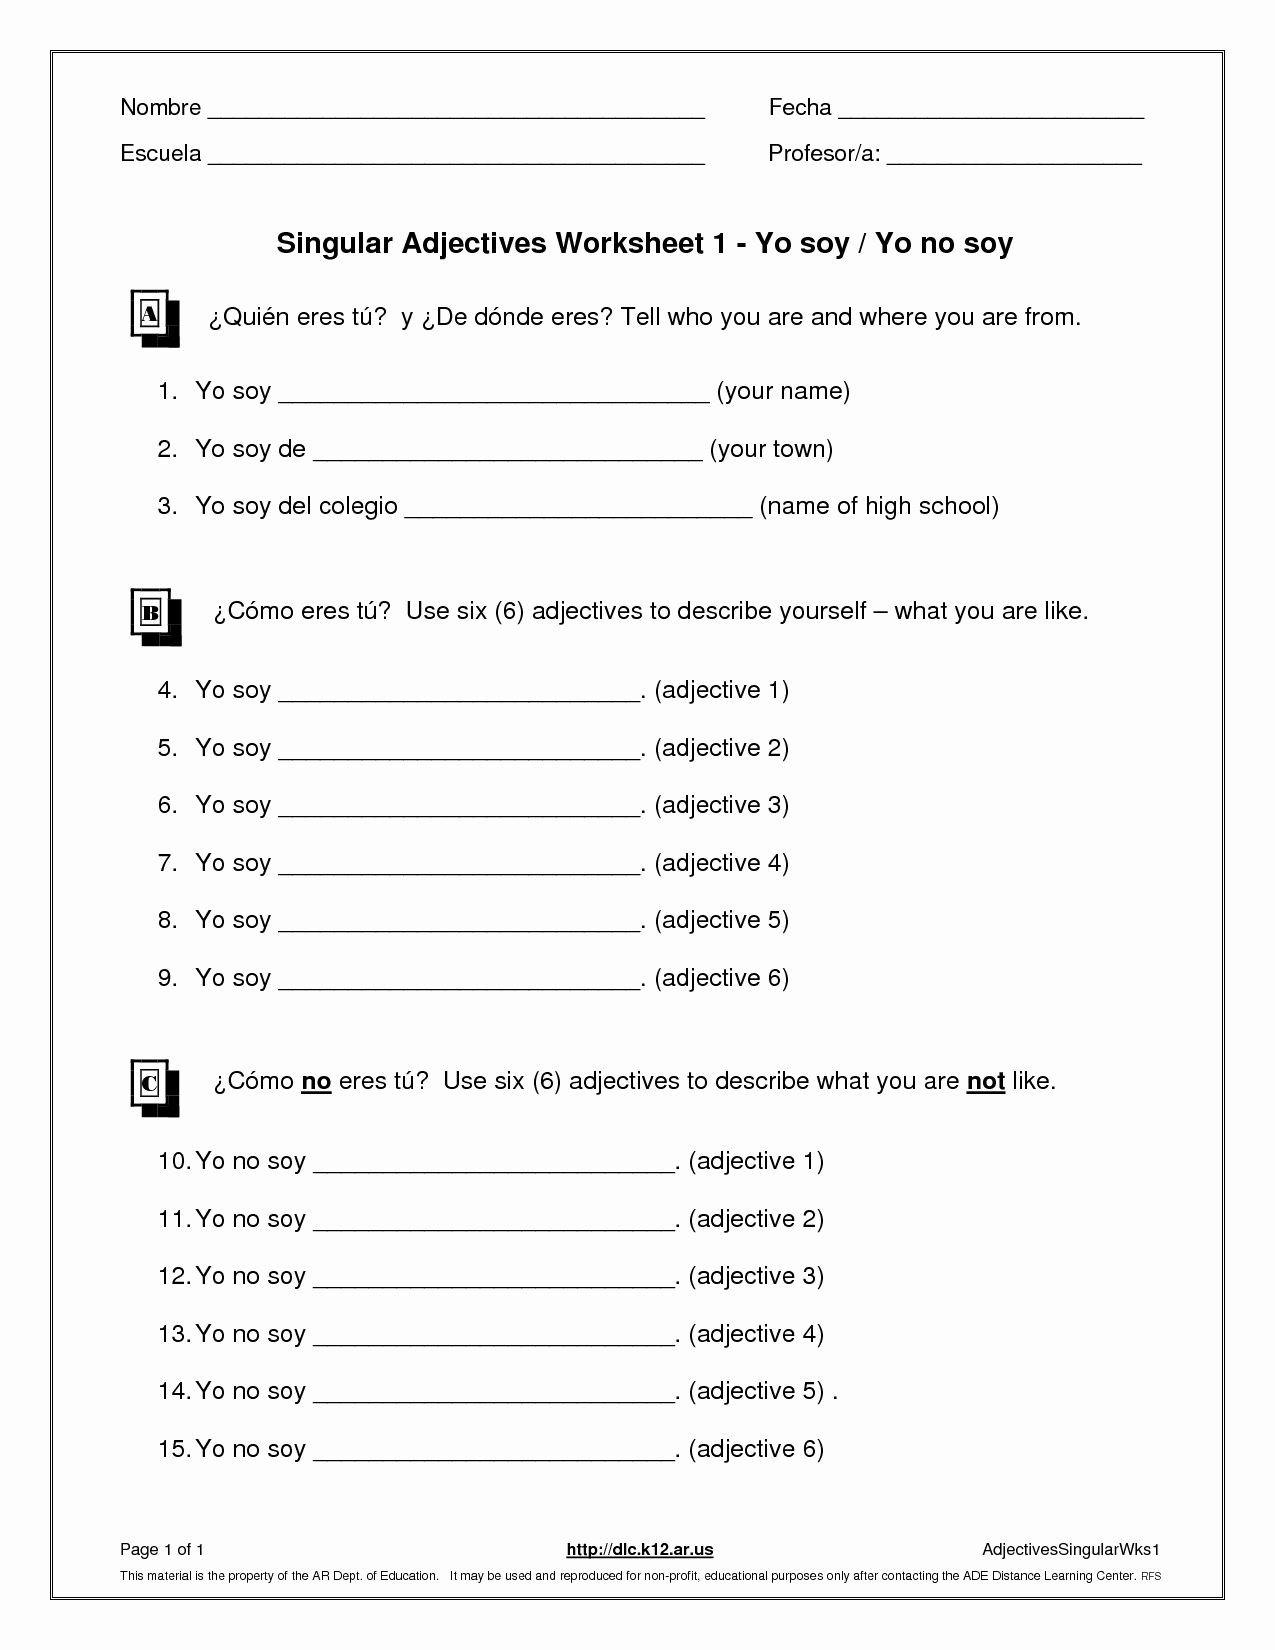 Anger Management Worksheet for Teenagers 50 Anger Management Worksheet for Teens In 2020 with Images